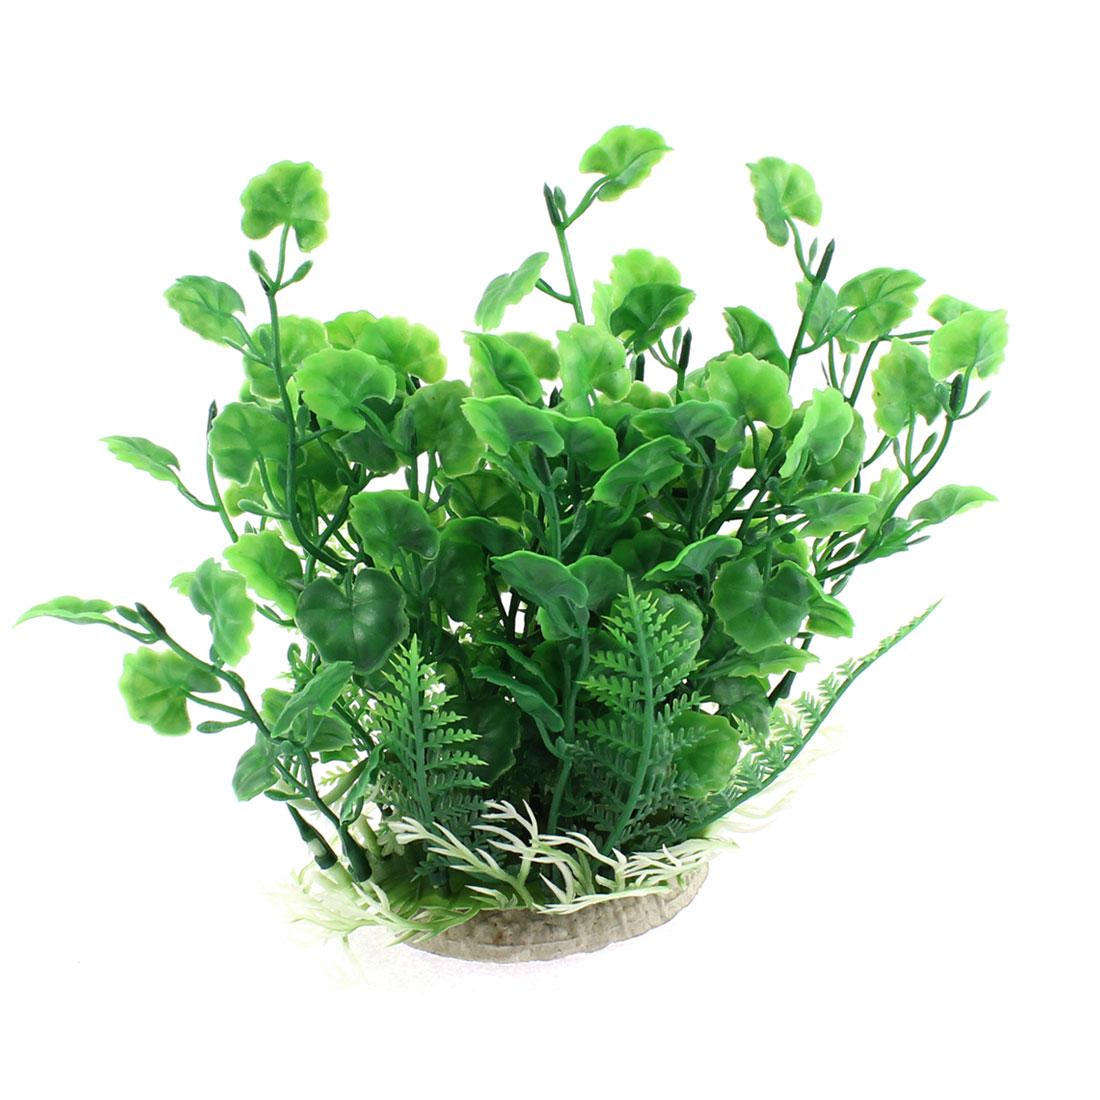 Fishbowl Aquarium Plastic Emulational Plant Grass Ornament 17cm Height